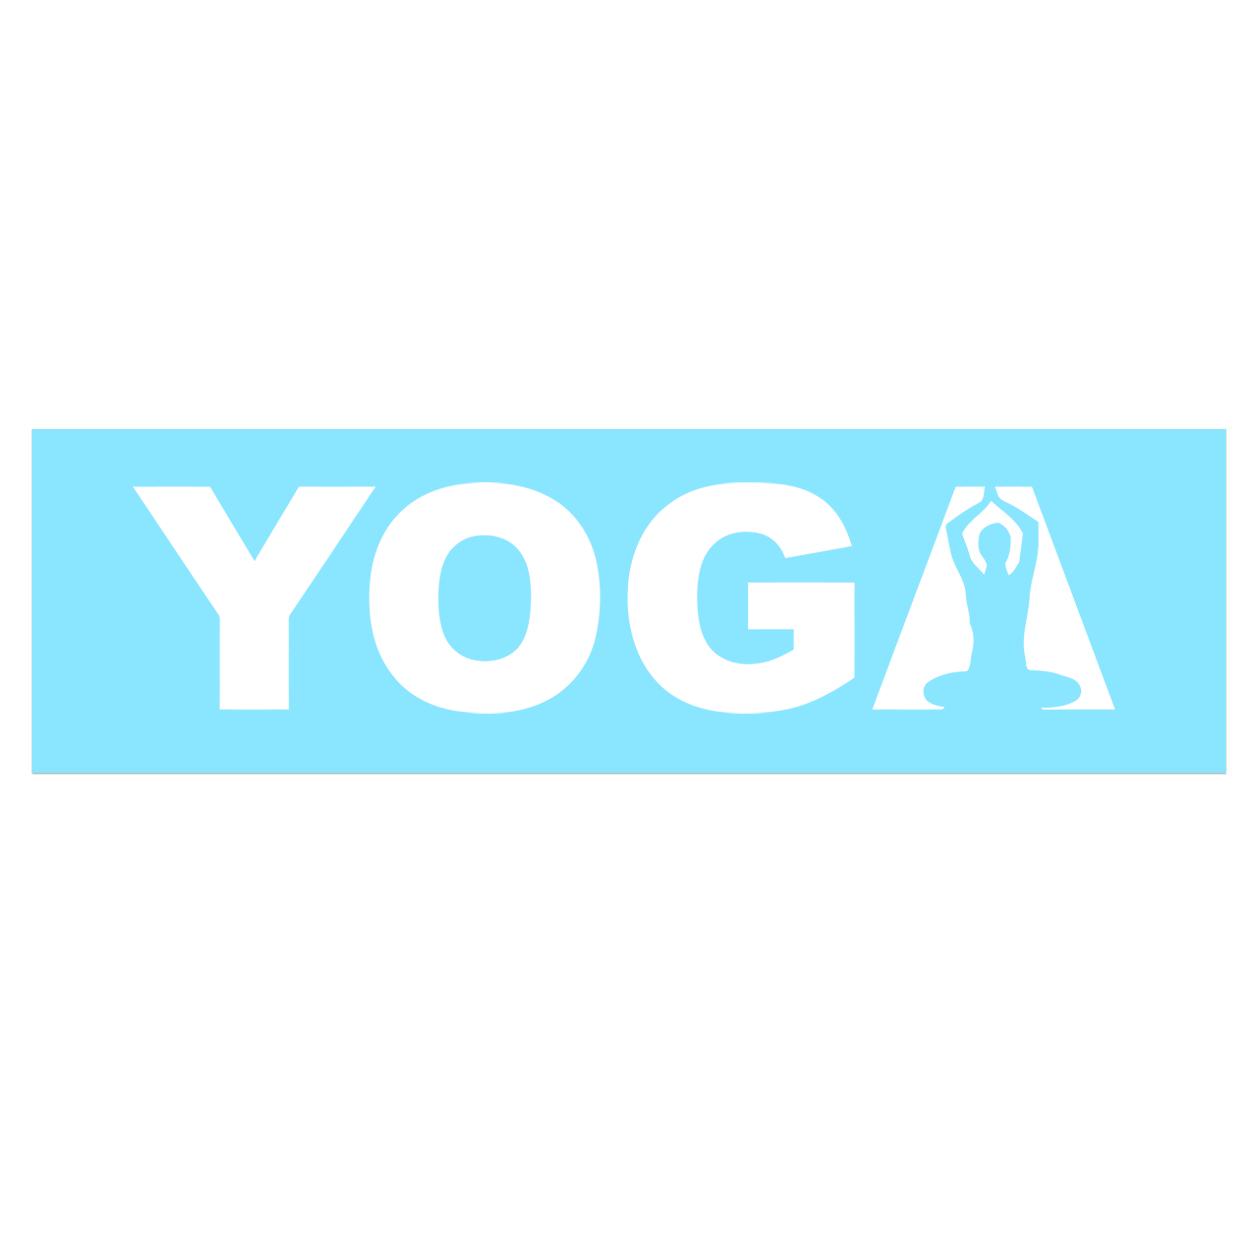 Yoga Meditation Logo Classic Decal (White Logo)